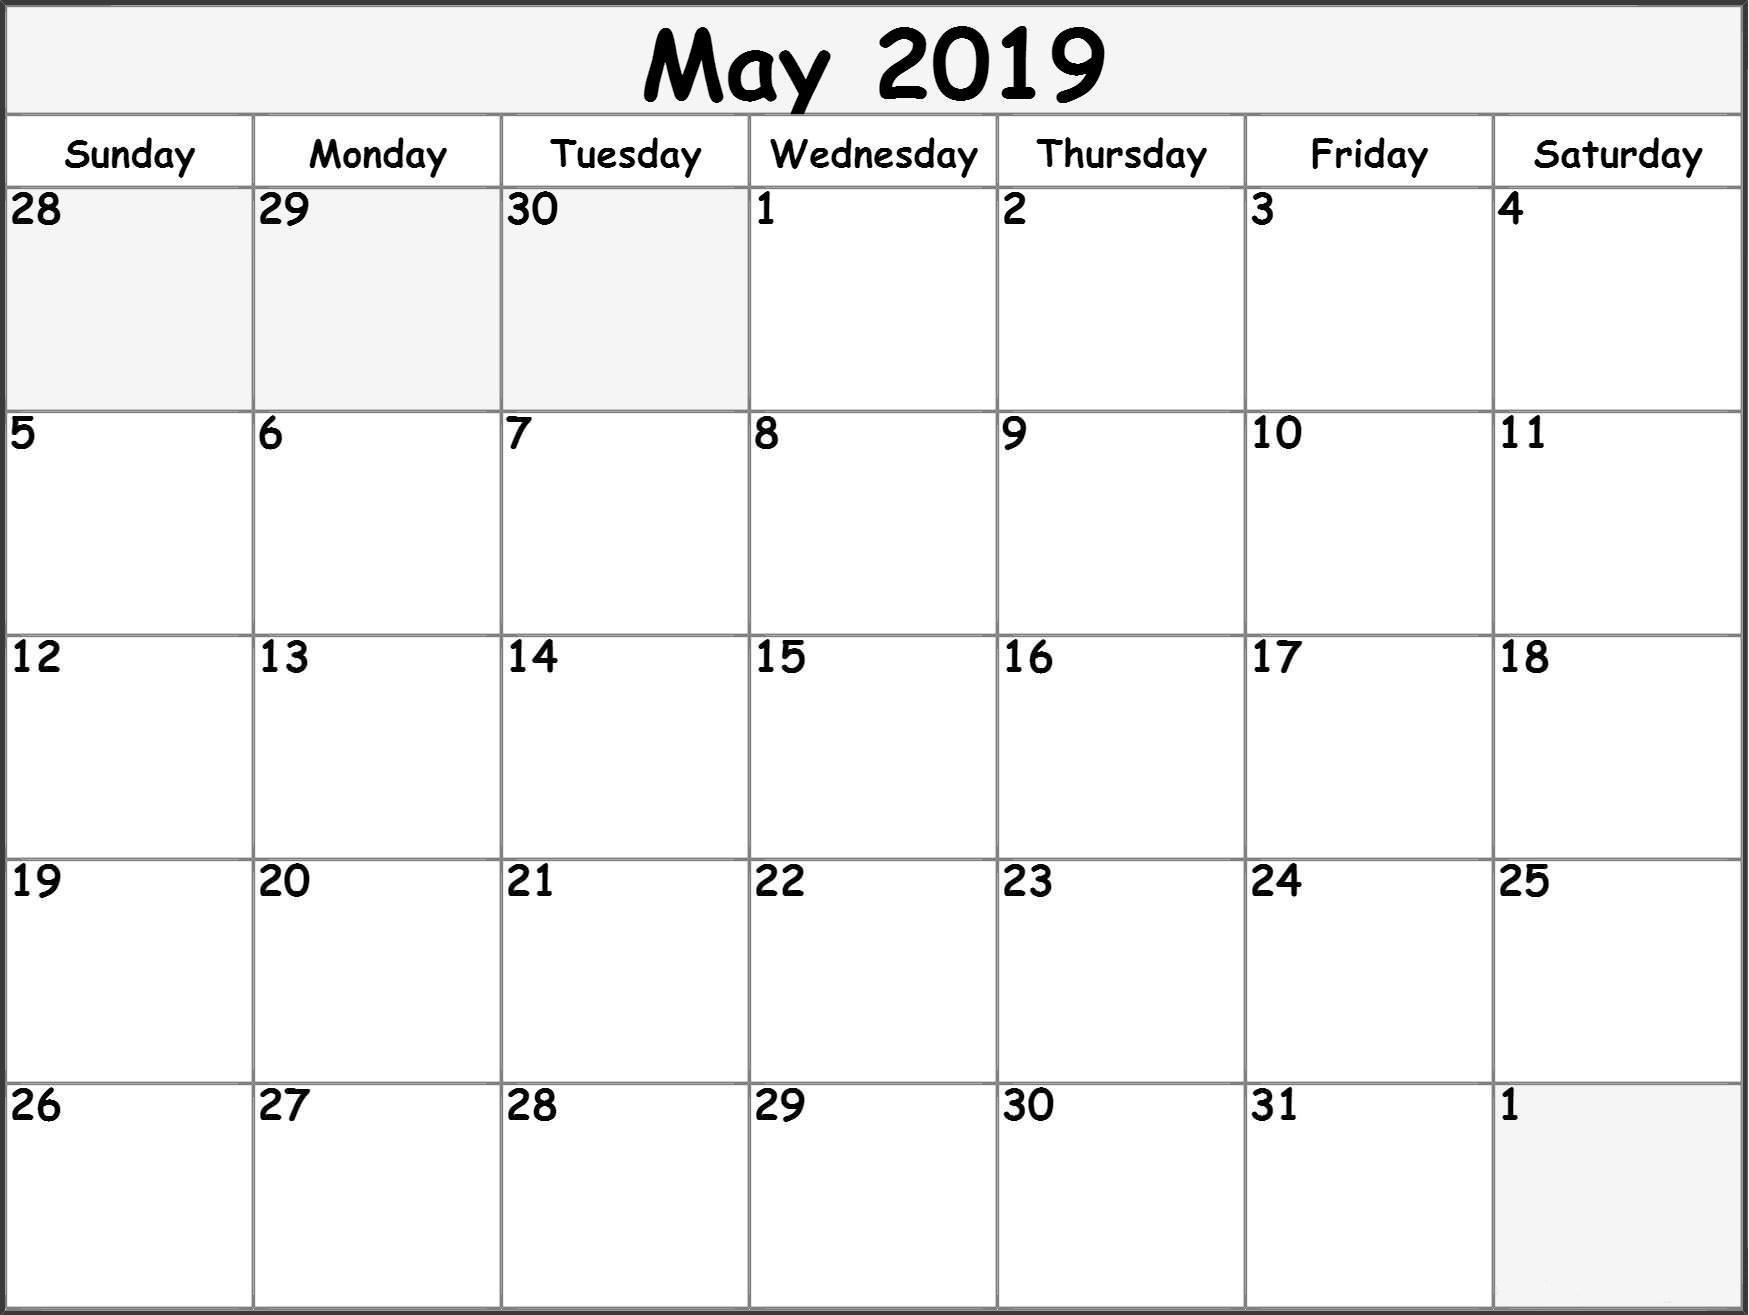 May 2019 Printable Calendar Templates - Free Blank, Pdf, Holidays for Free Blank Calendar Templates To Print